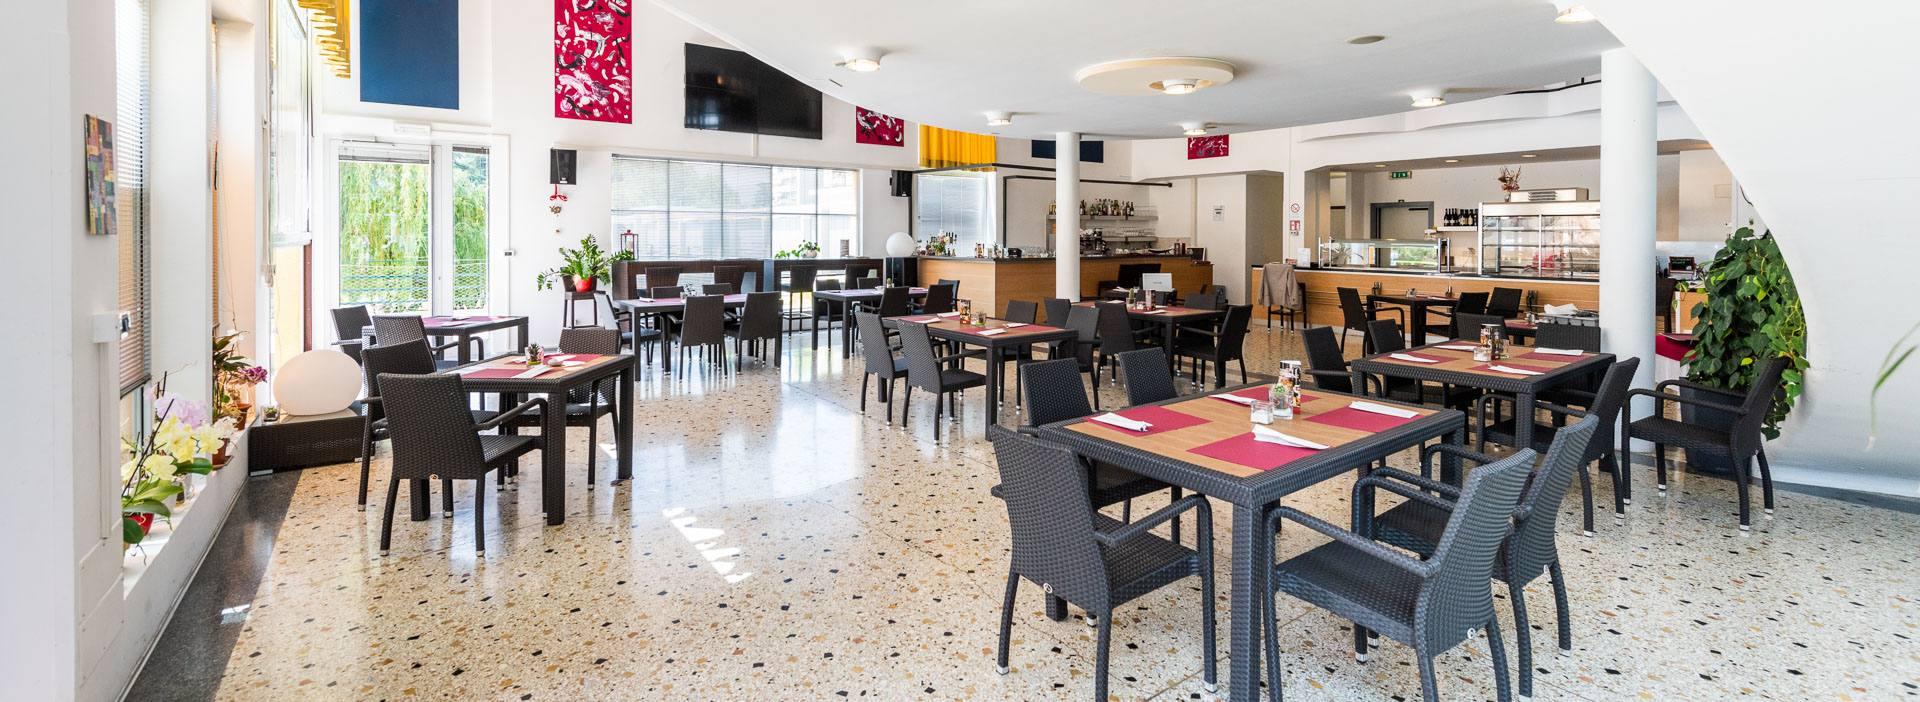 Restaurant Pizzeria Lido